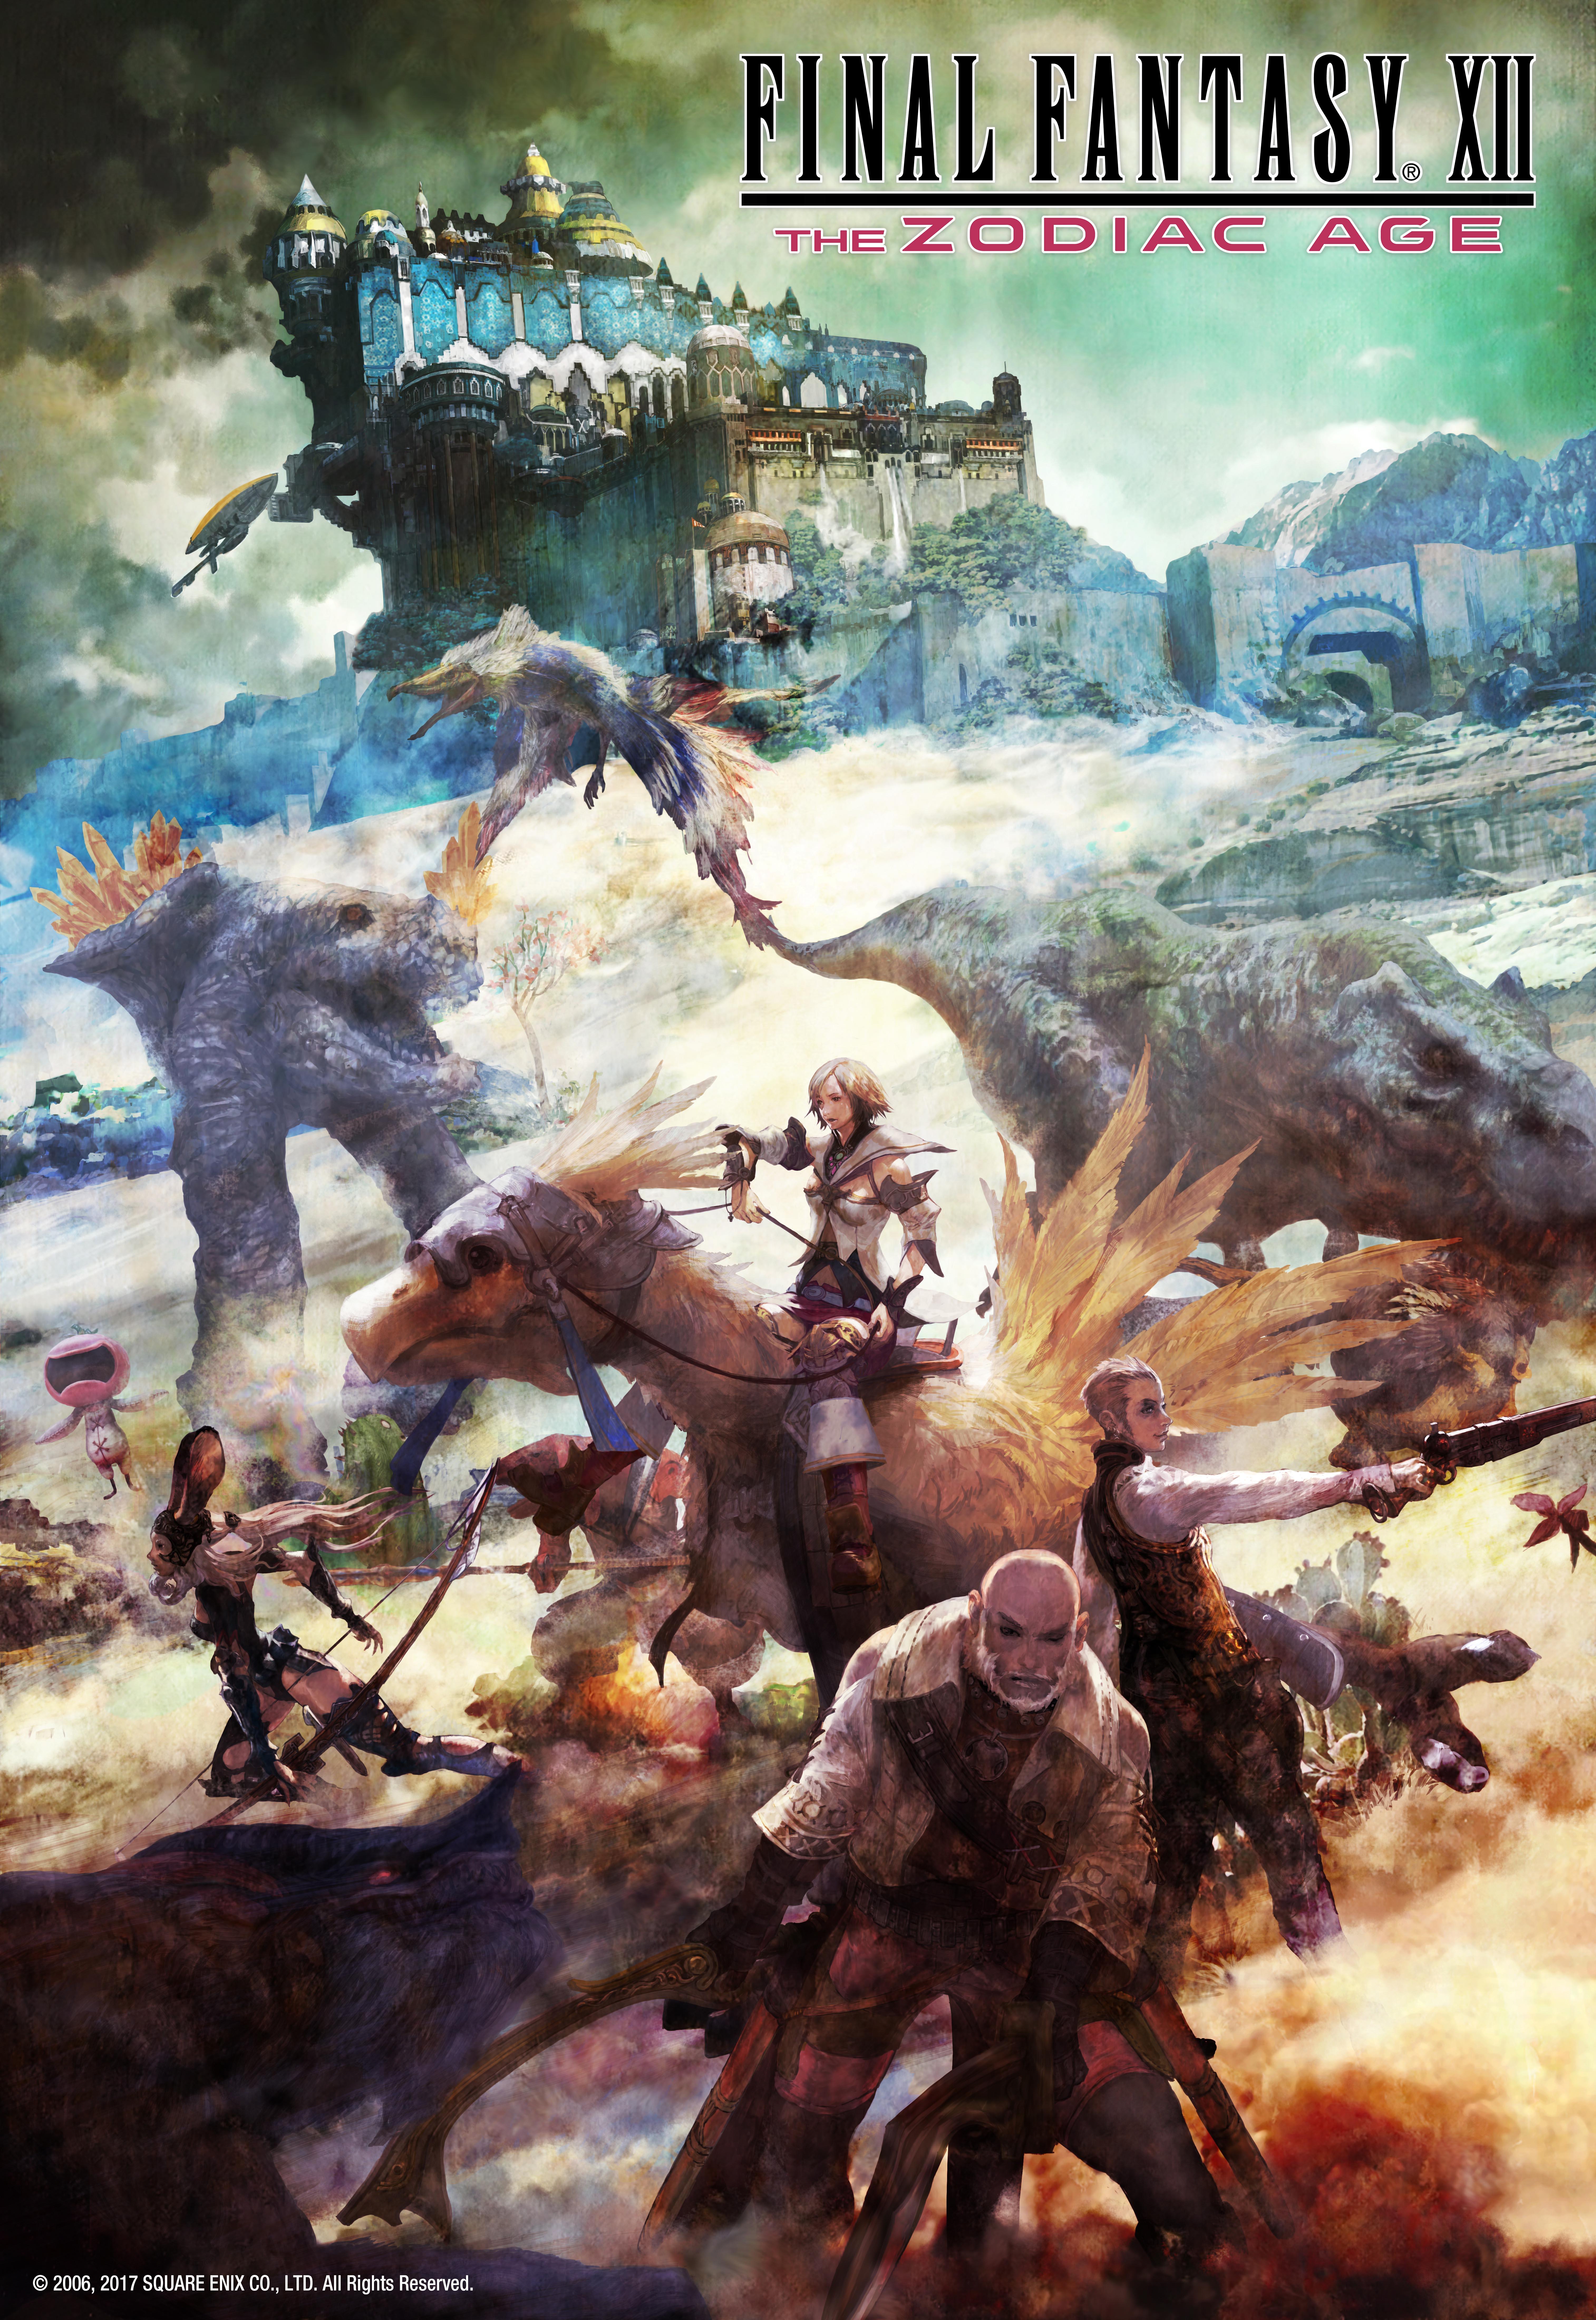 Final-Fantasy-XII-The-Zodiac-Age_2018_01-11-18_016